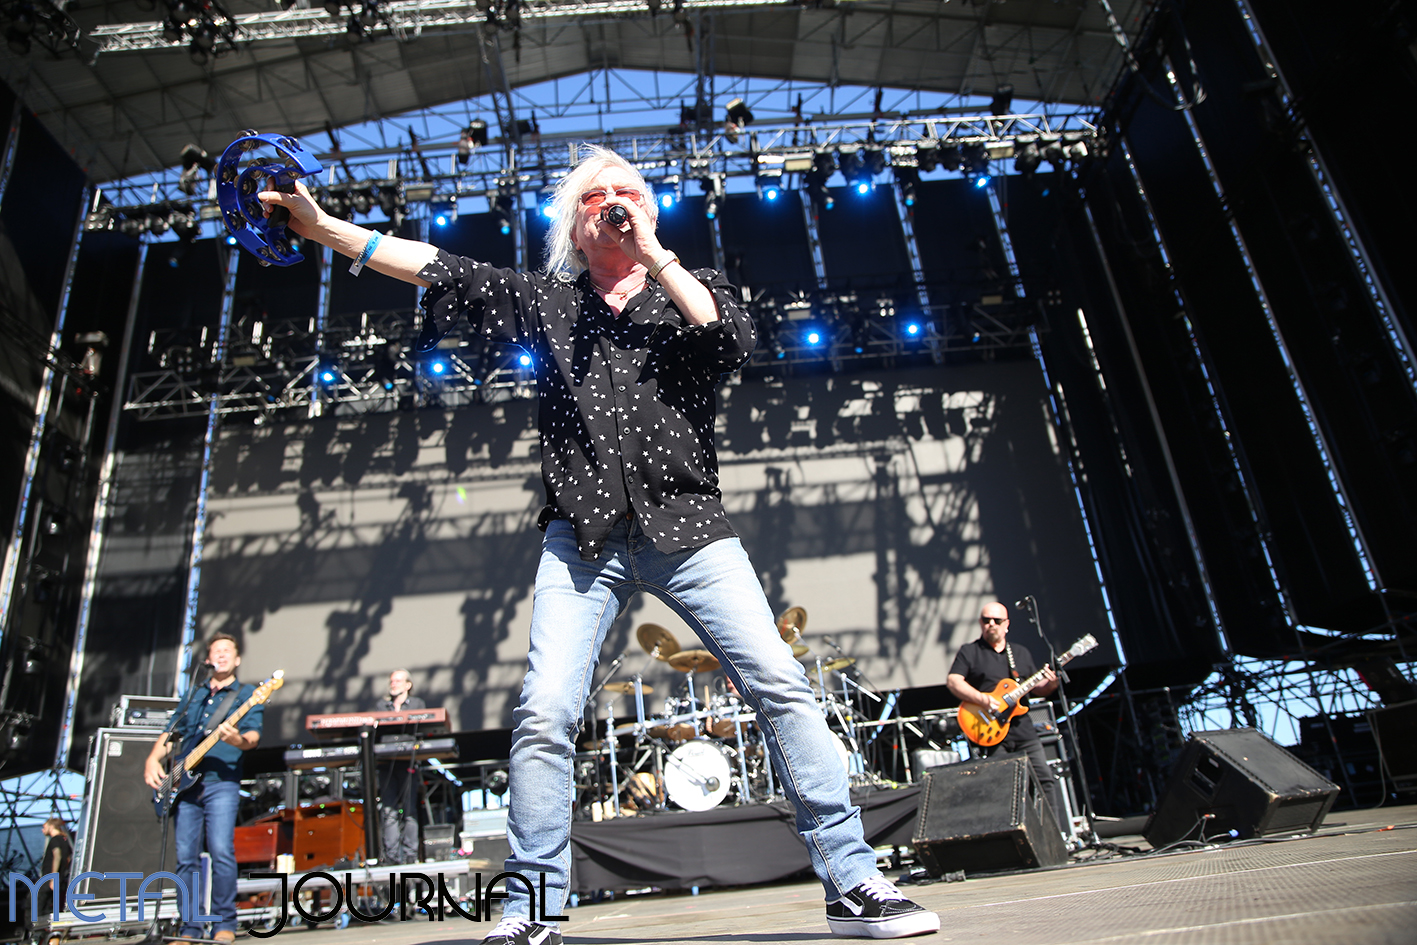 magnum metal journal rock the coast 2019 pic 1